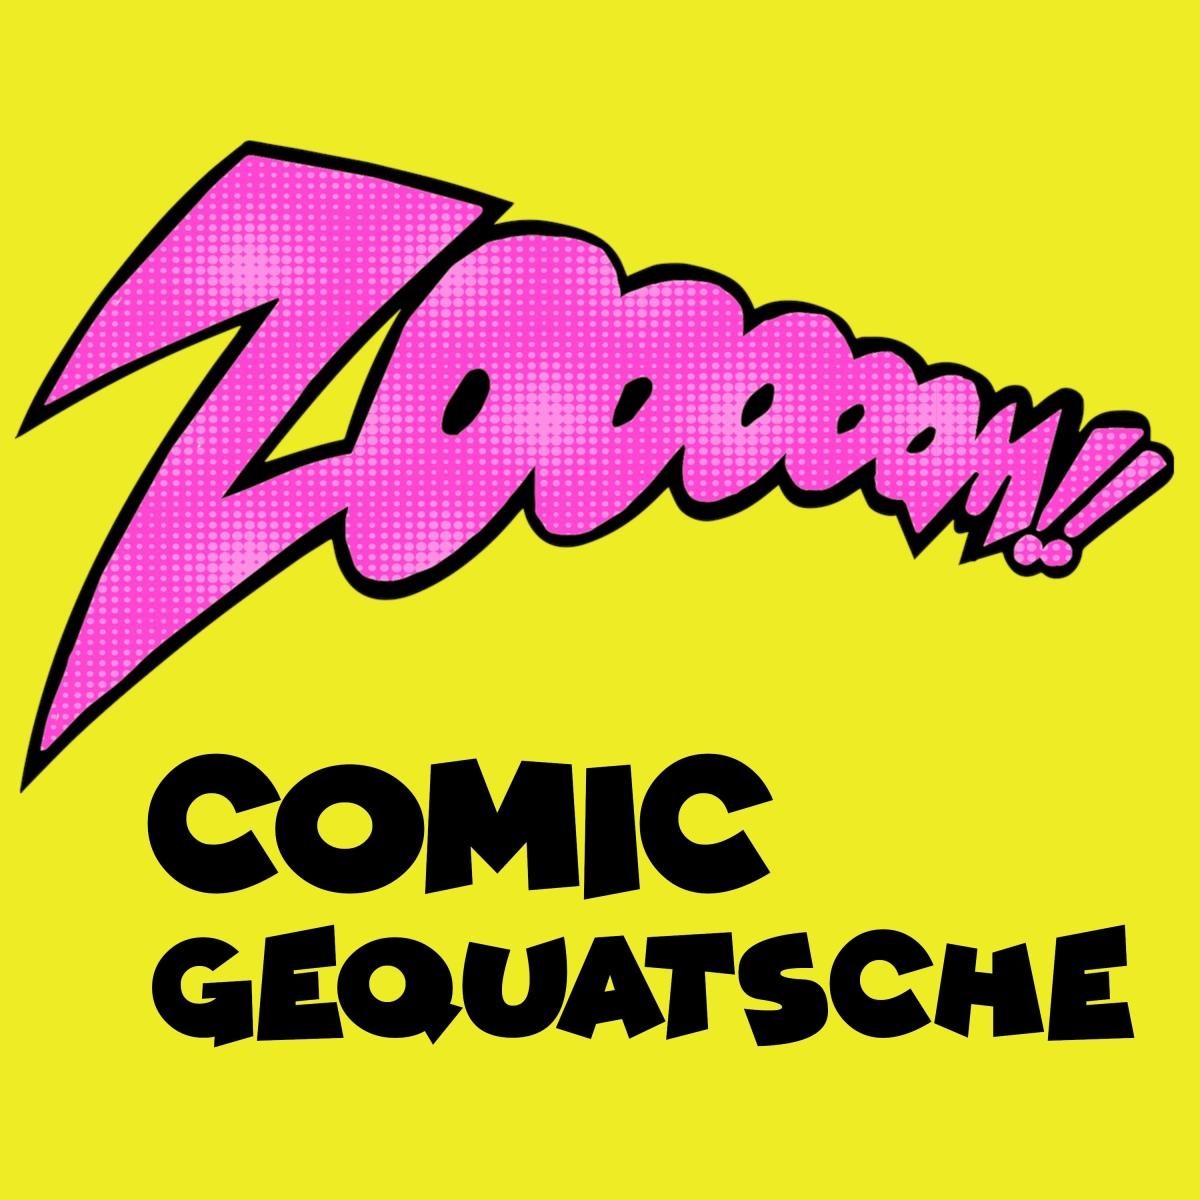 Zufallsgenerator 02 | Comic-Gequatsche #9.1 (12) | Audio-Gedankenspiel